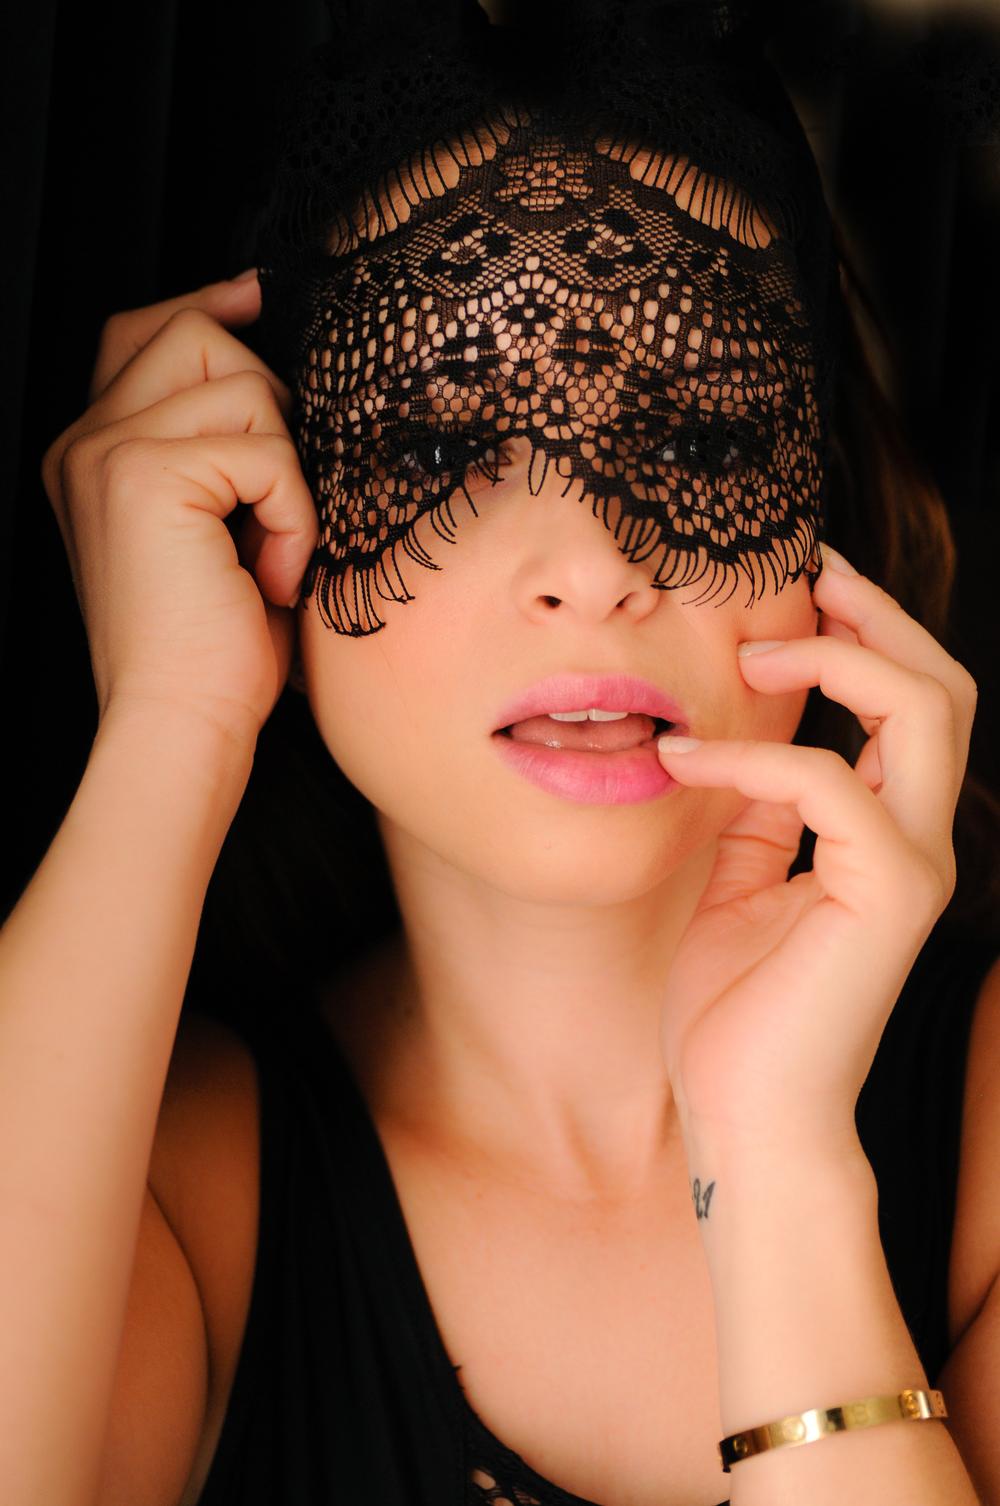 las vegas lifestyle boudoir, boudoir, las vegas photographer,beautiful woman